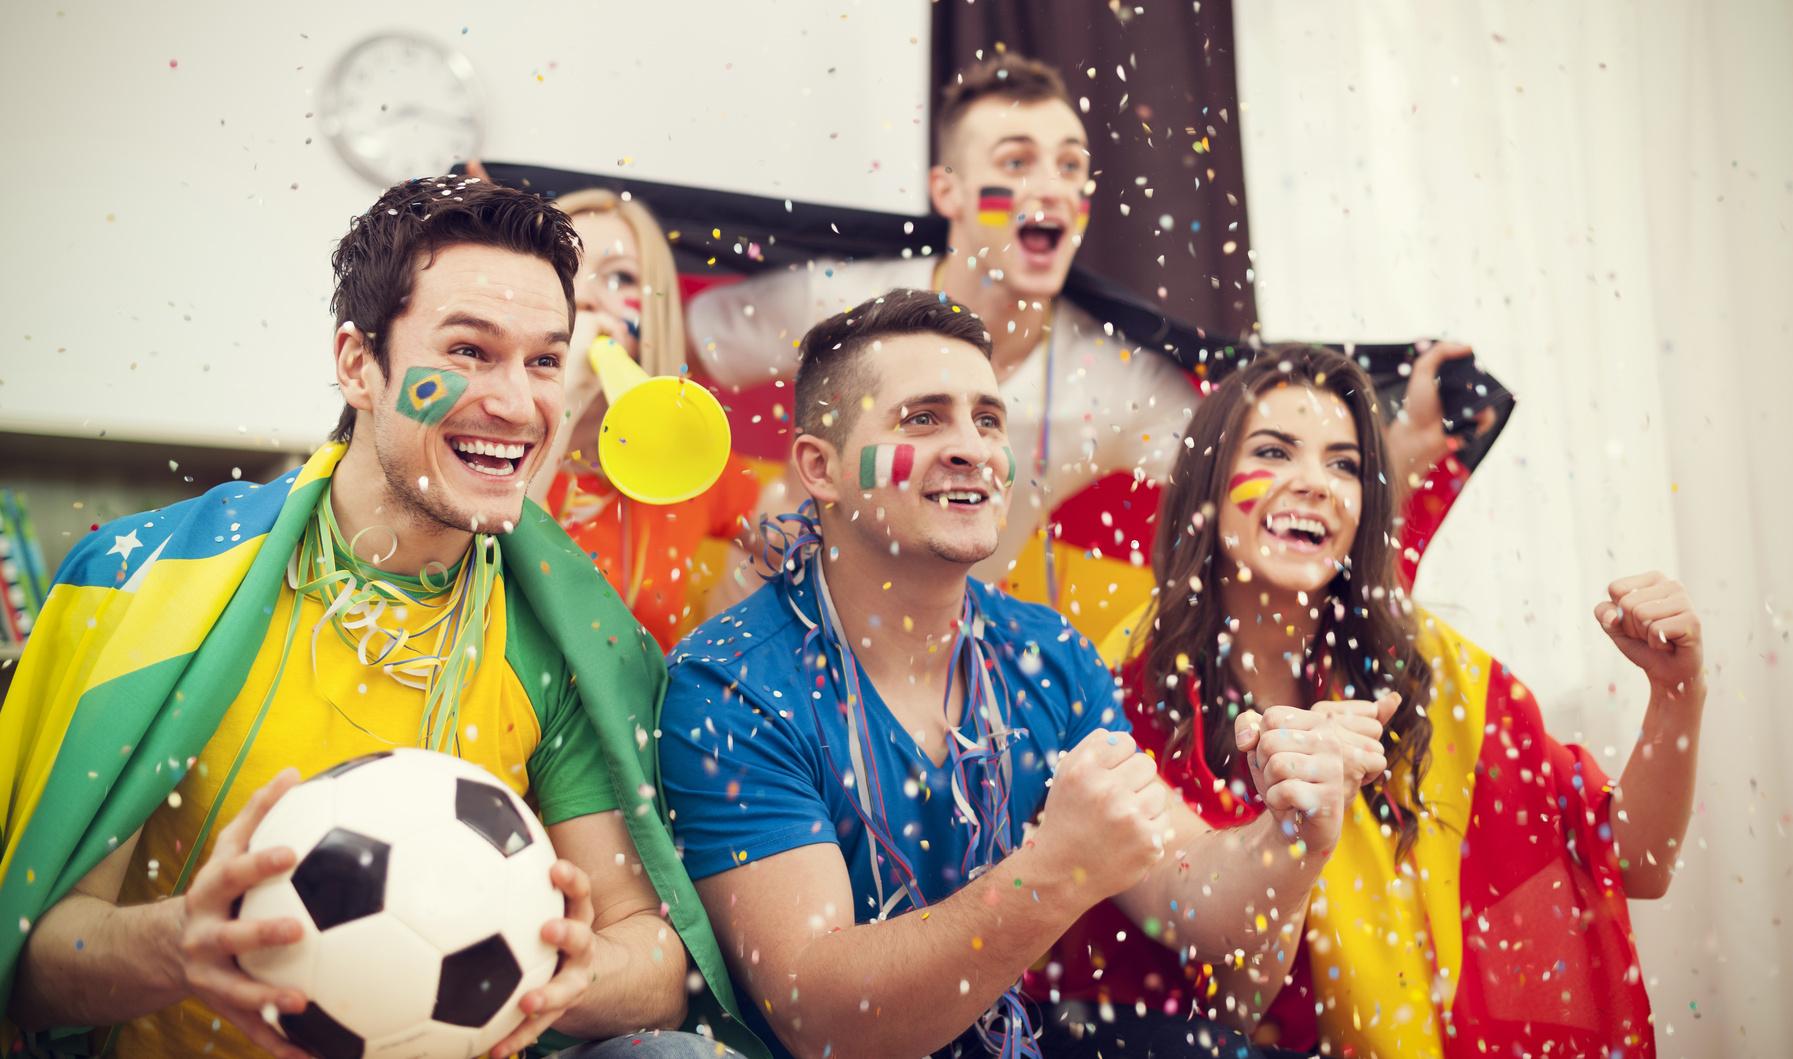 GOOOOOOOOOOOOL – McDonalds i sportowa gorączka piłka nożna Fotolia 63870786 Subscription Monthly M